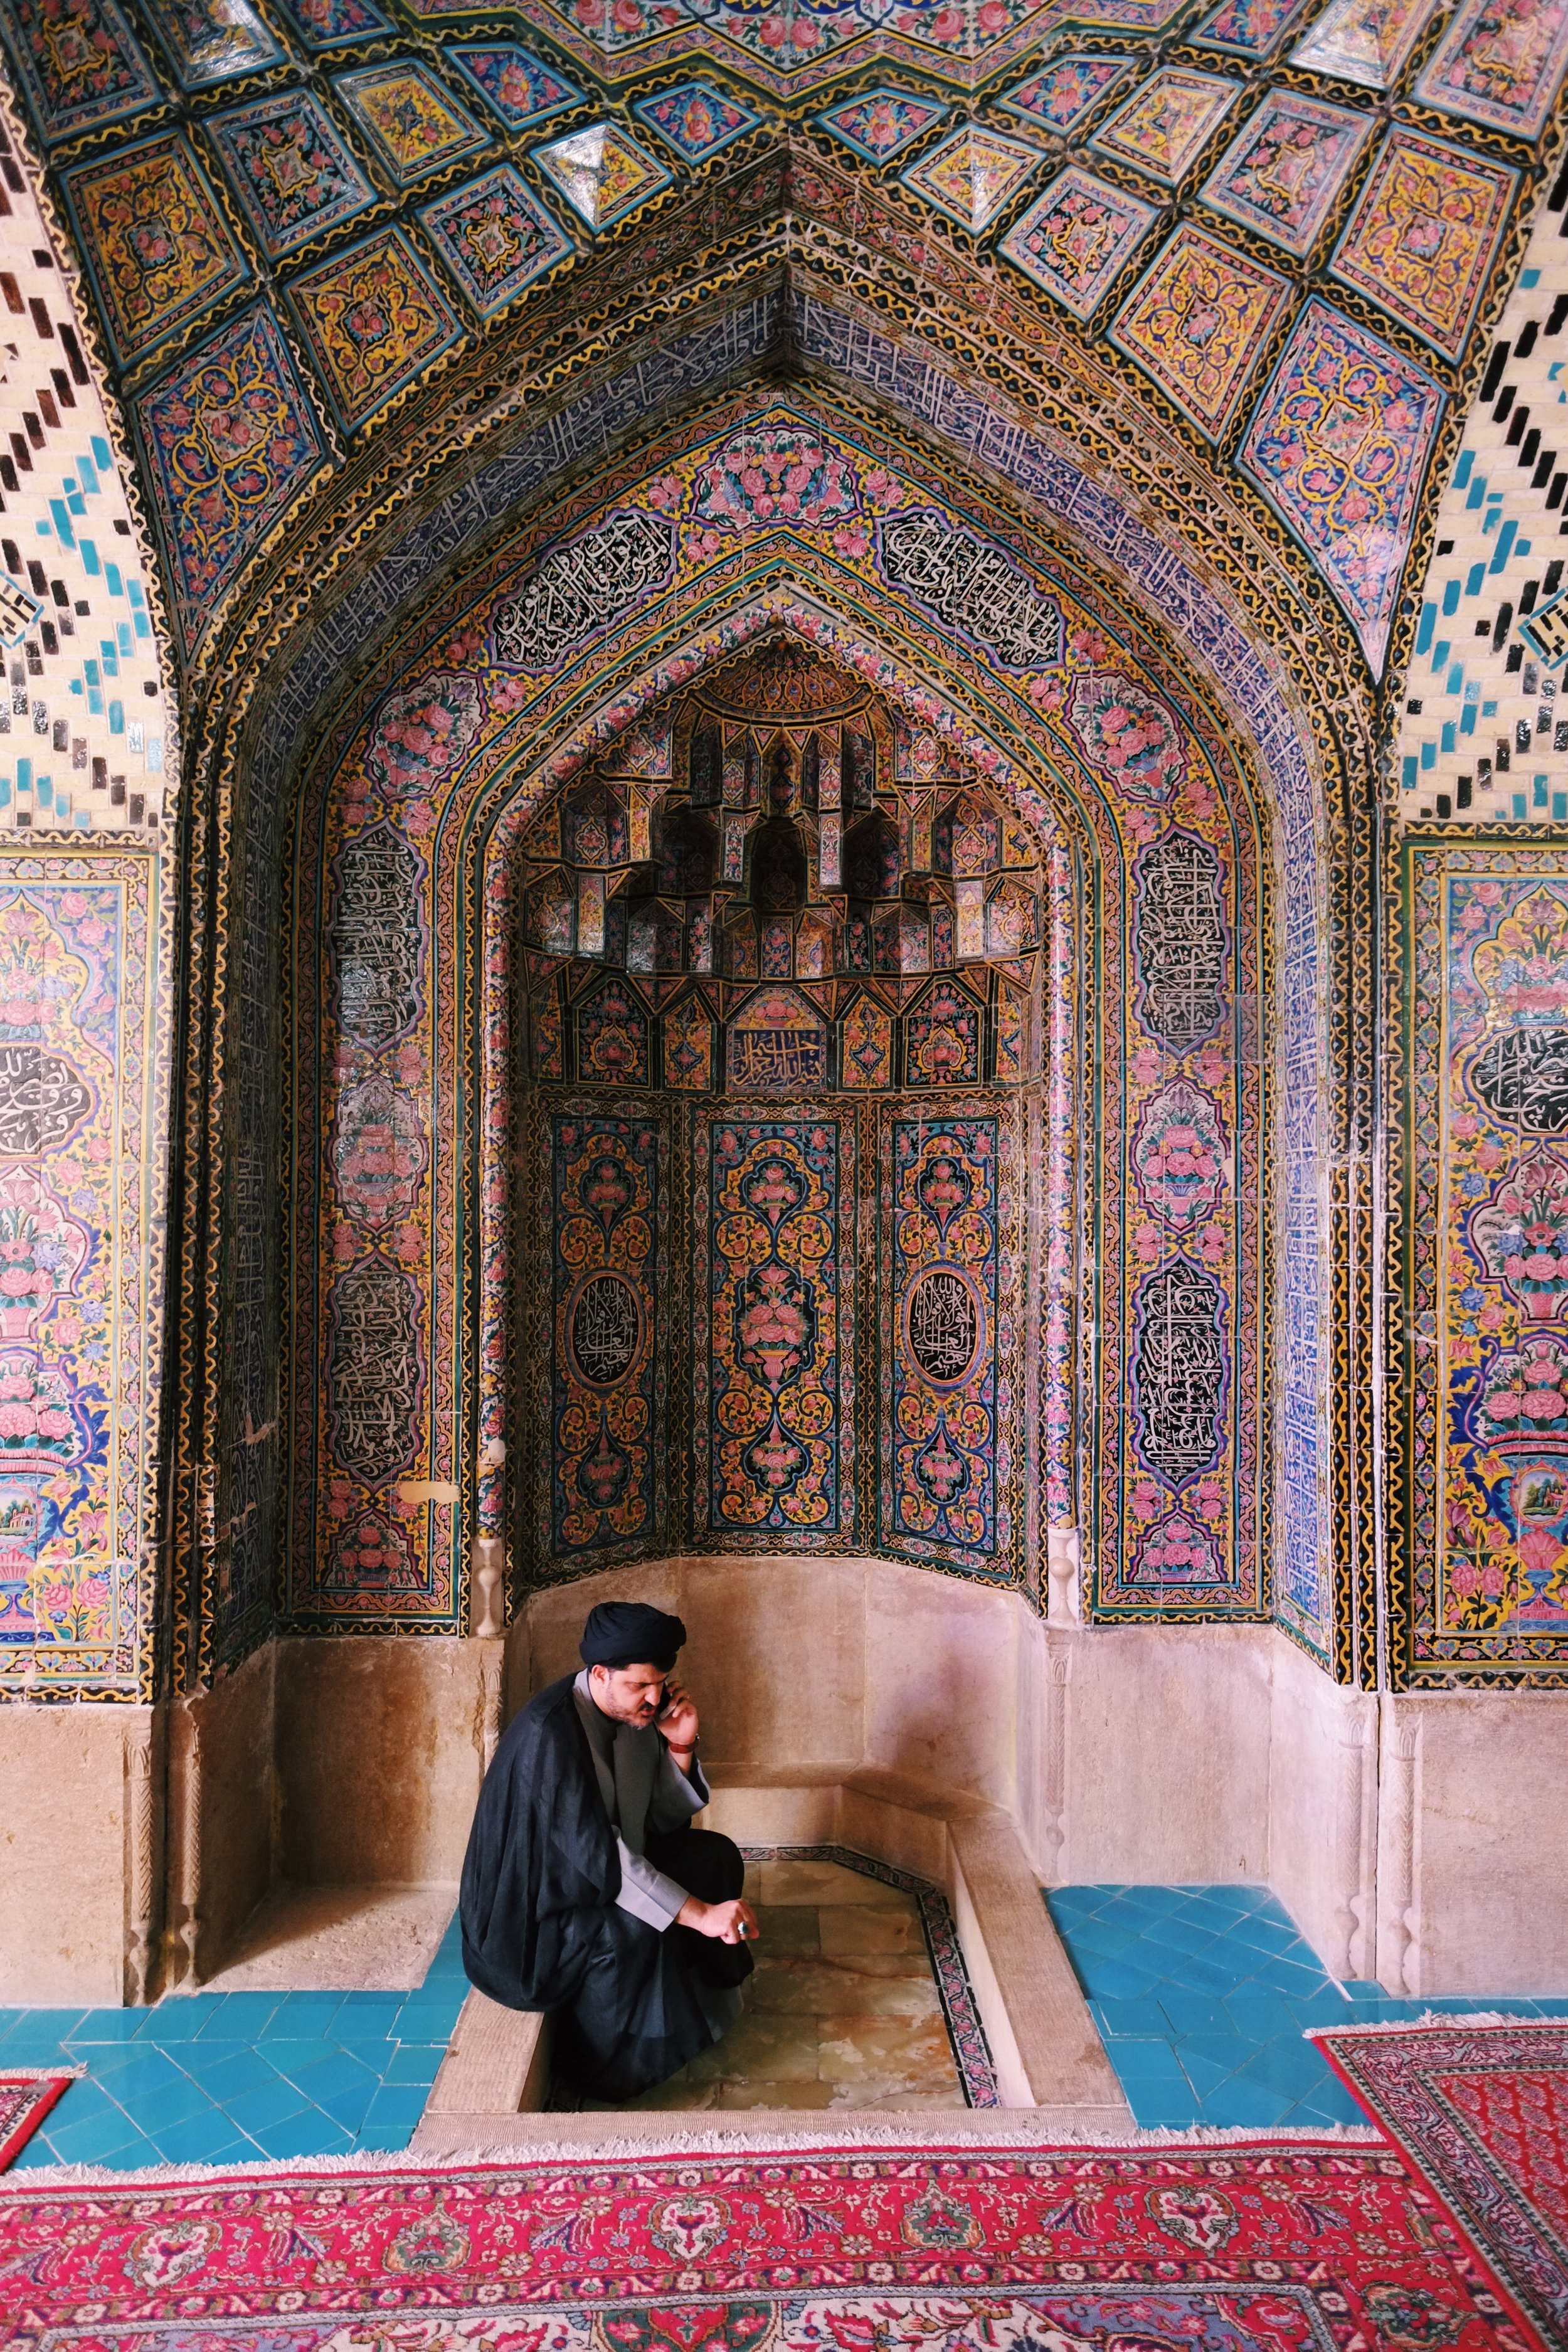 Pink Mosque in Iran by Joost Bastmeijer.jpeg